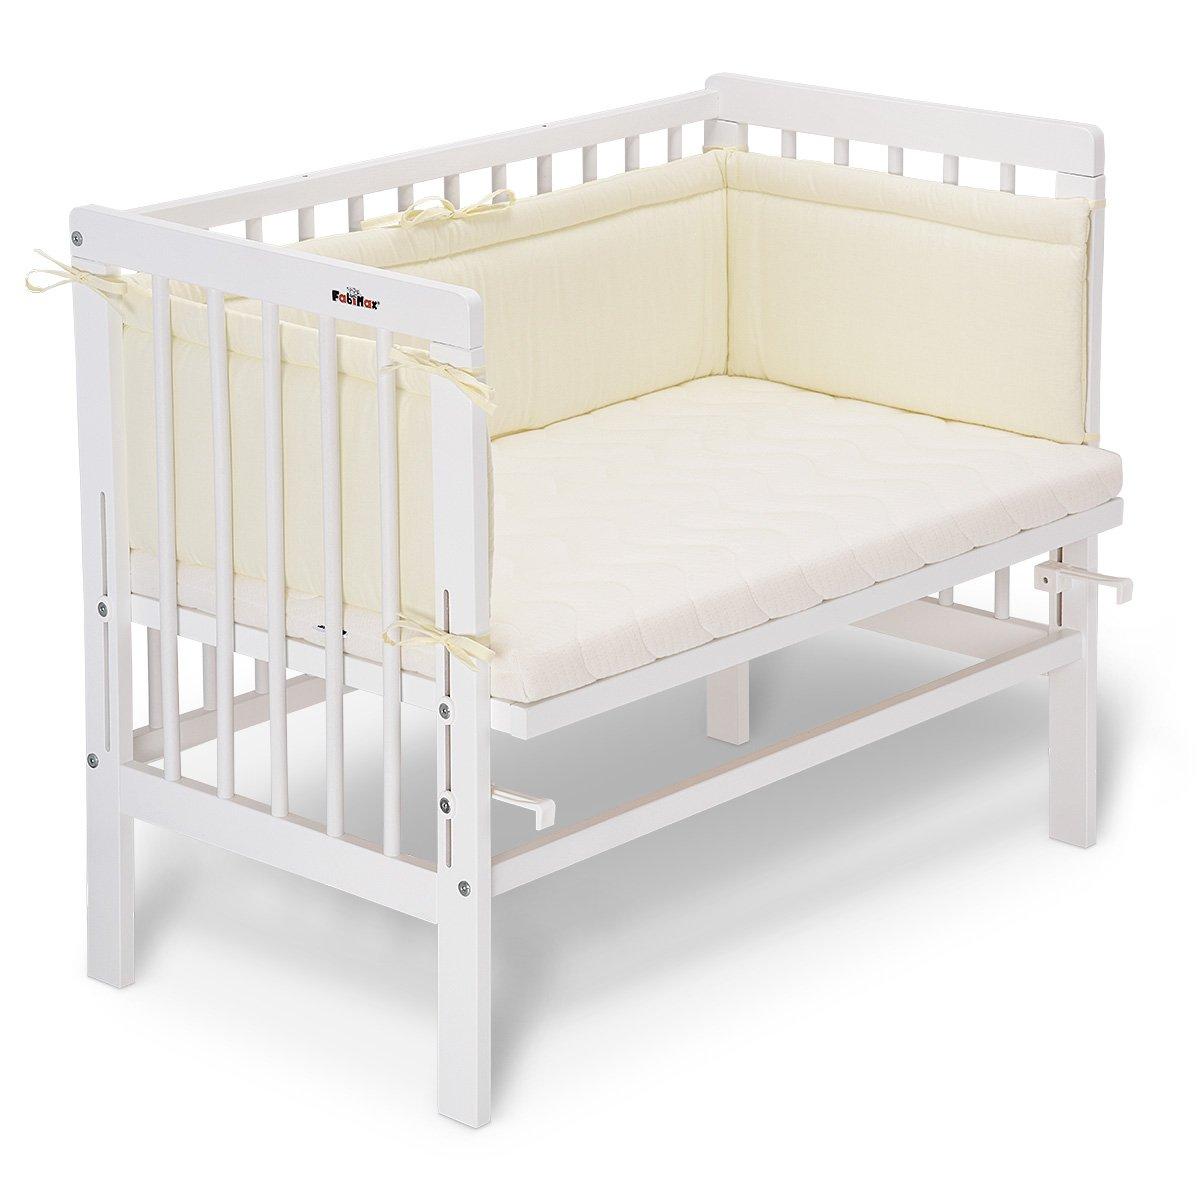 fabimax cama auxiliar Basic Color Blanco, Incluye Colchón y protector de cuna azul 03. Sterne klein/blau Talla:mit Matratze CLASSIC FabiMax GmbH 3894